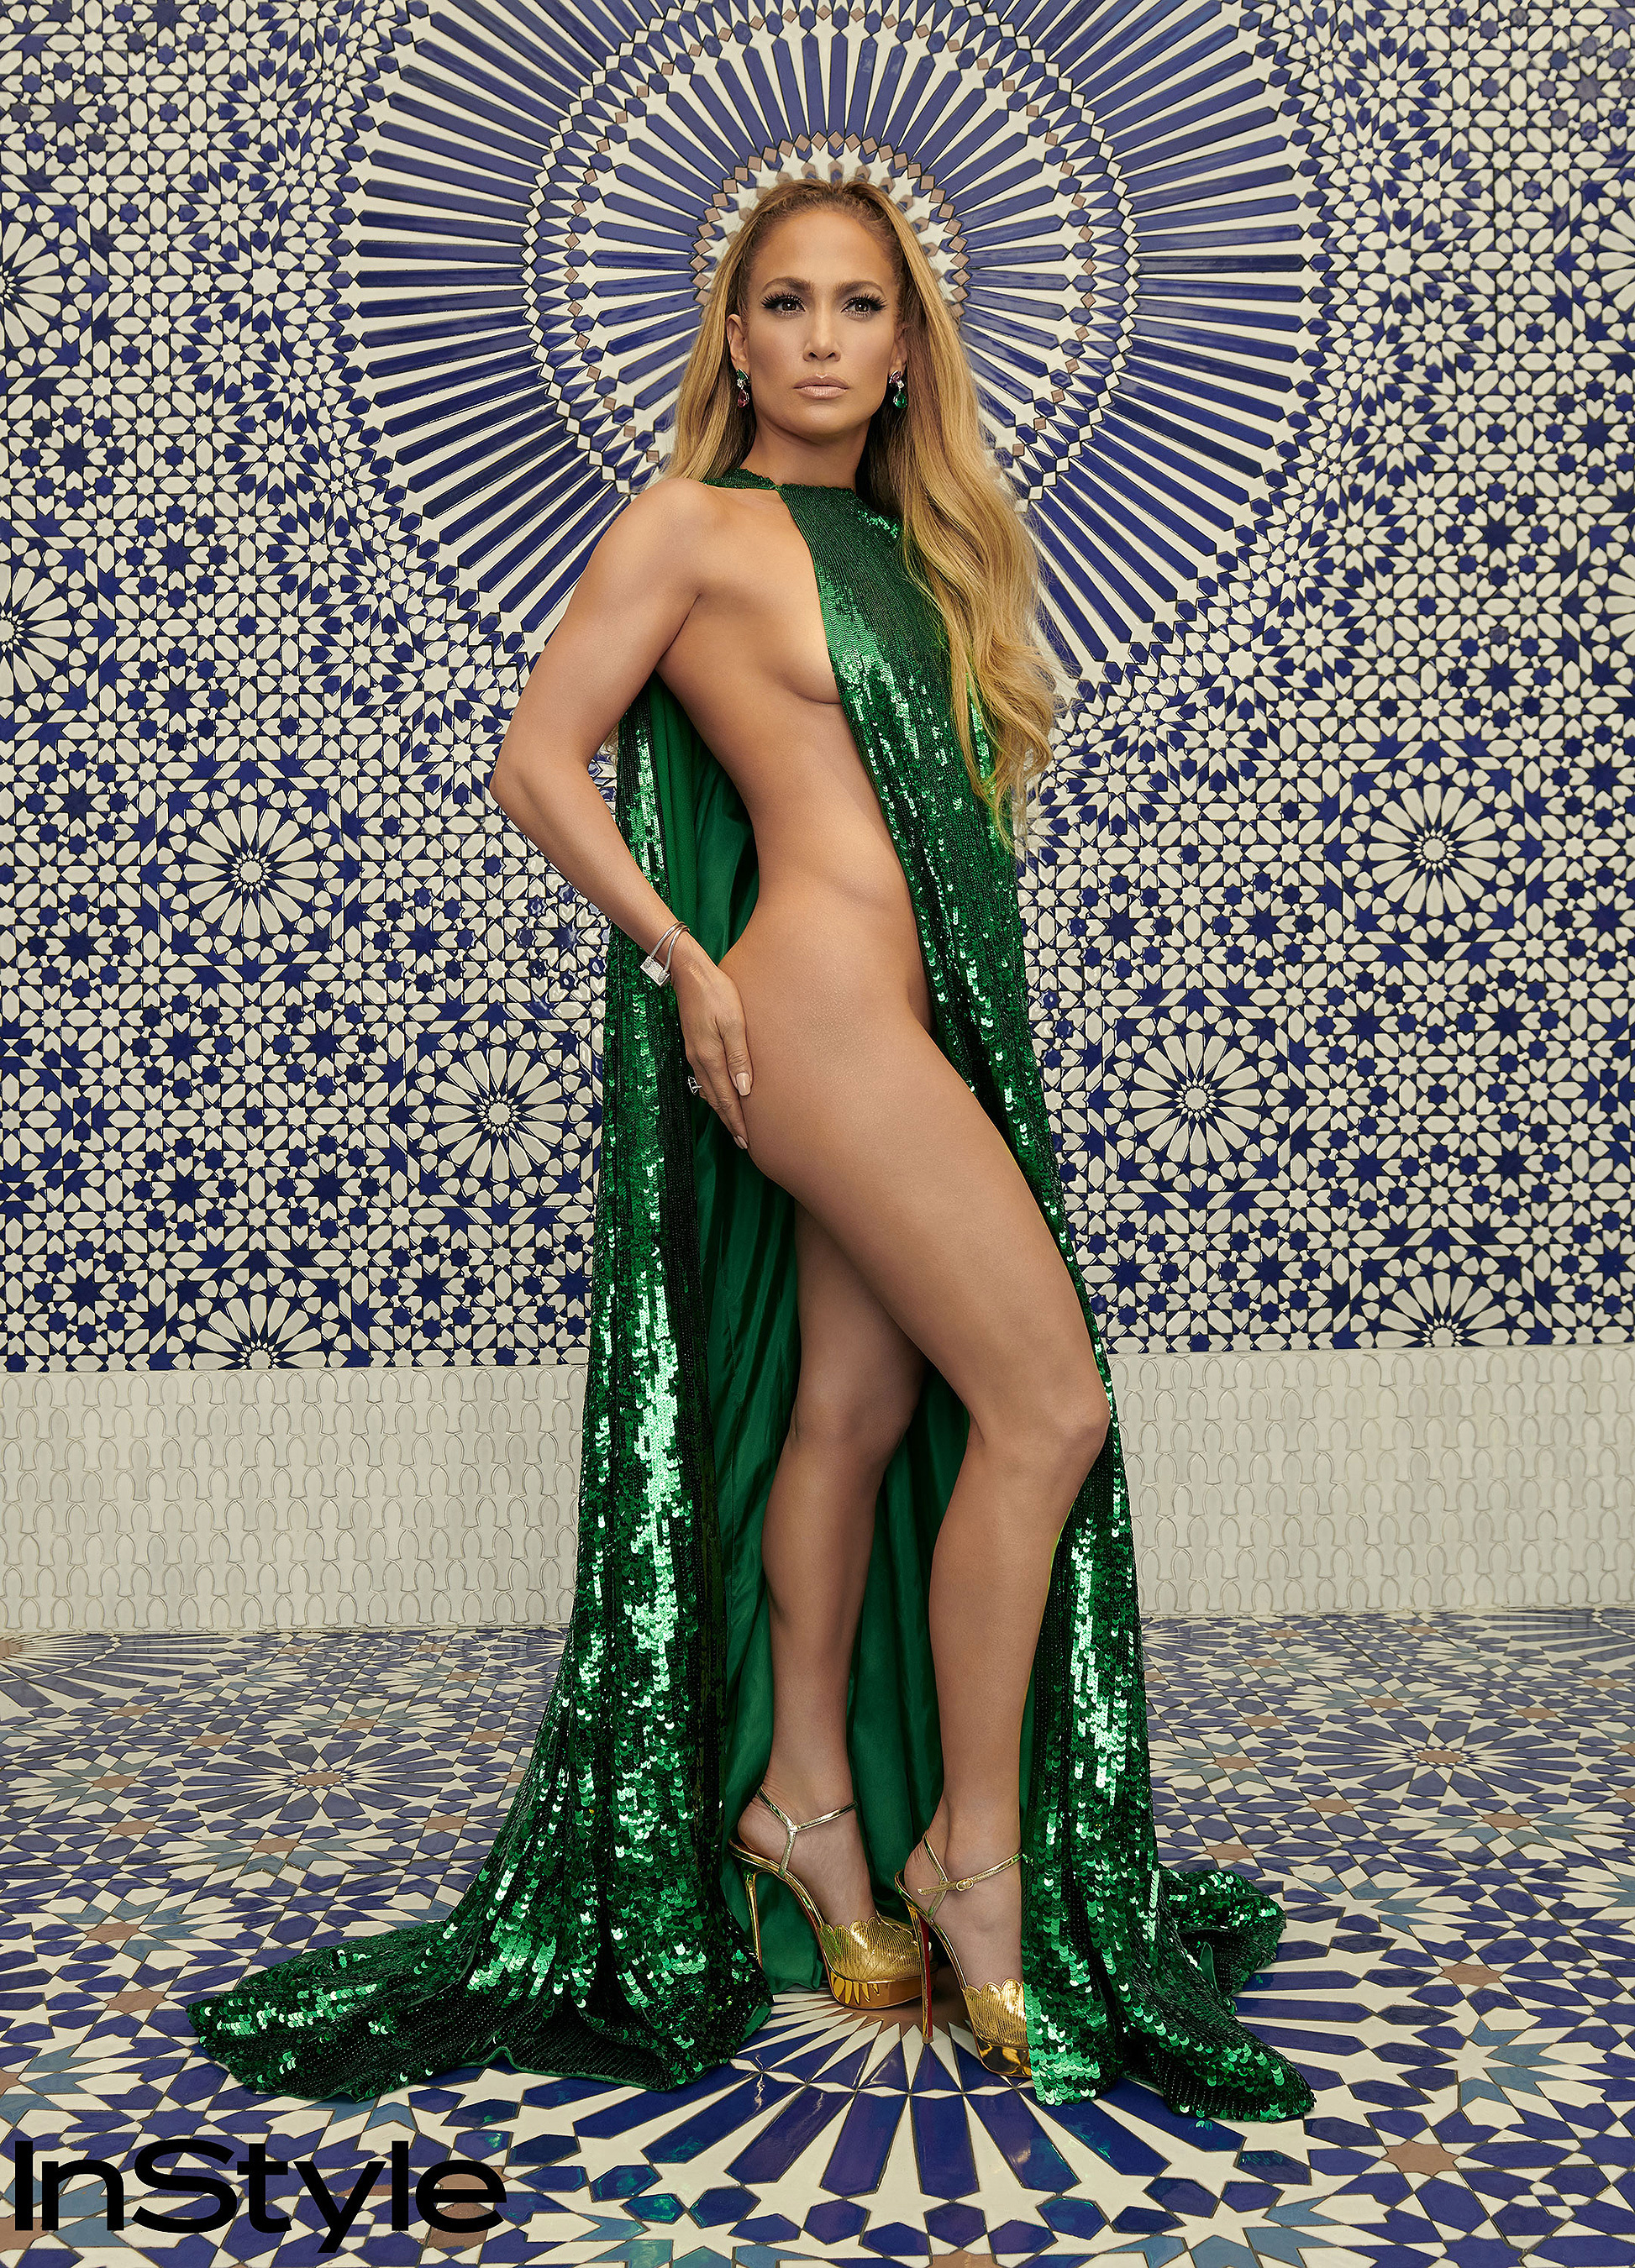 jennifer-lopez-sexy-december-issue-of-instyle-magazine